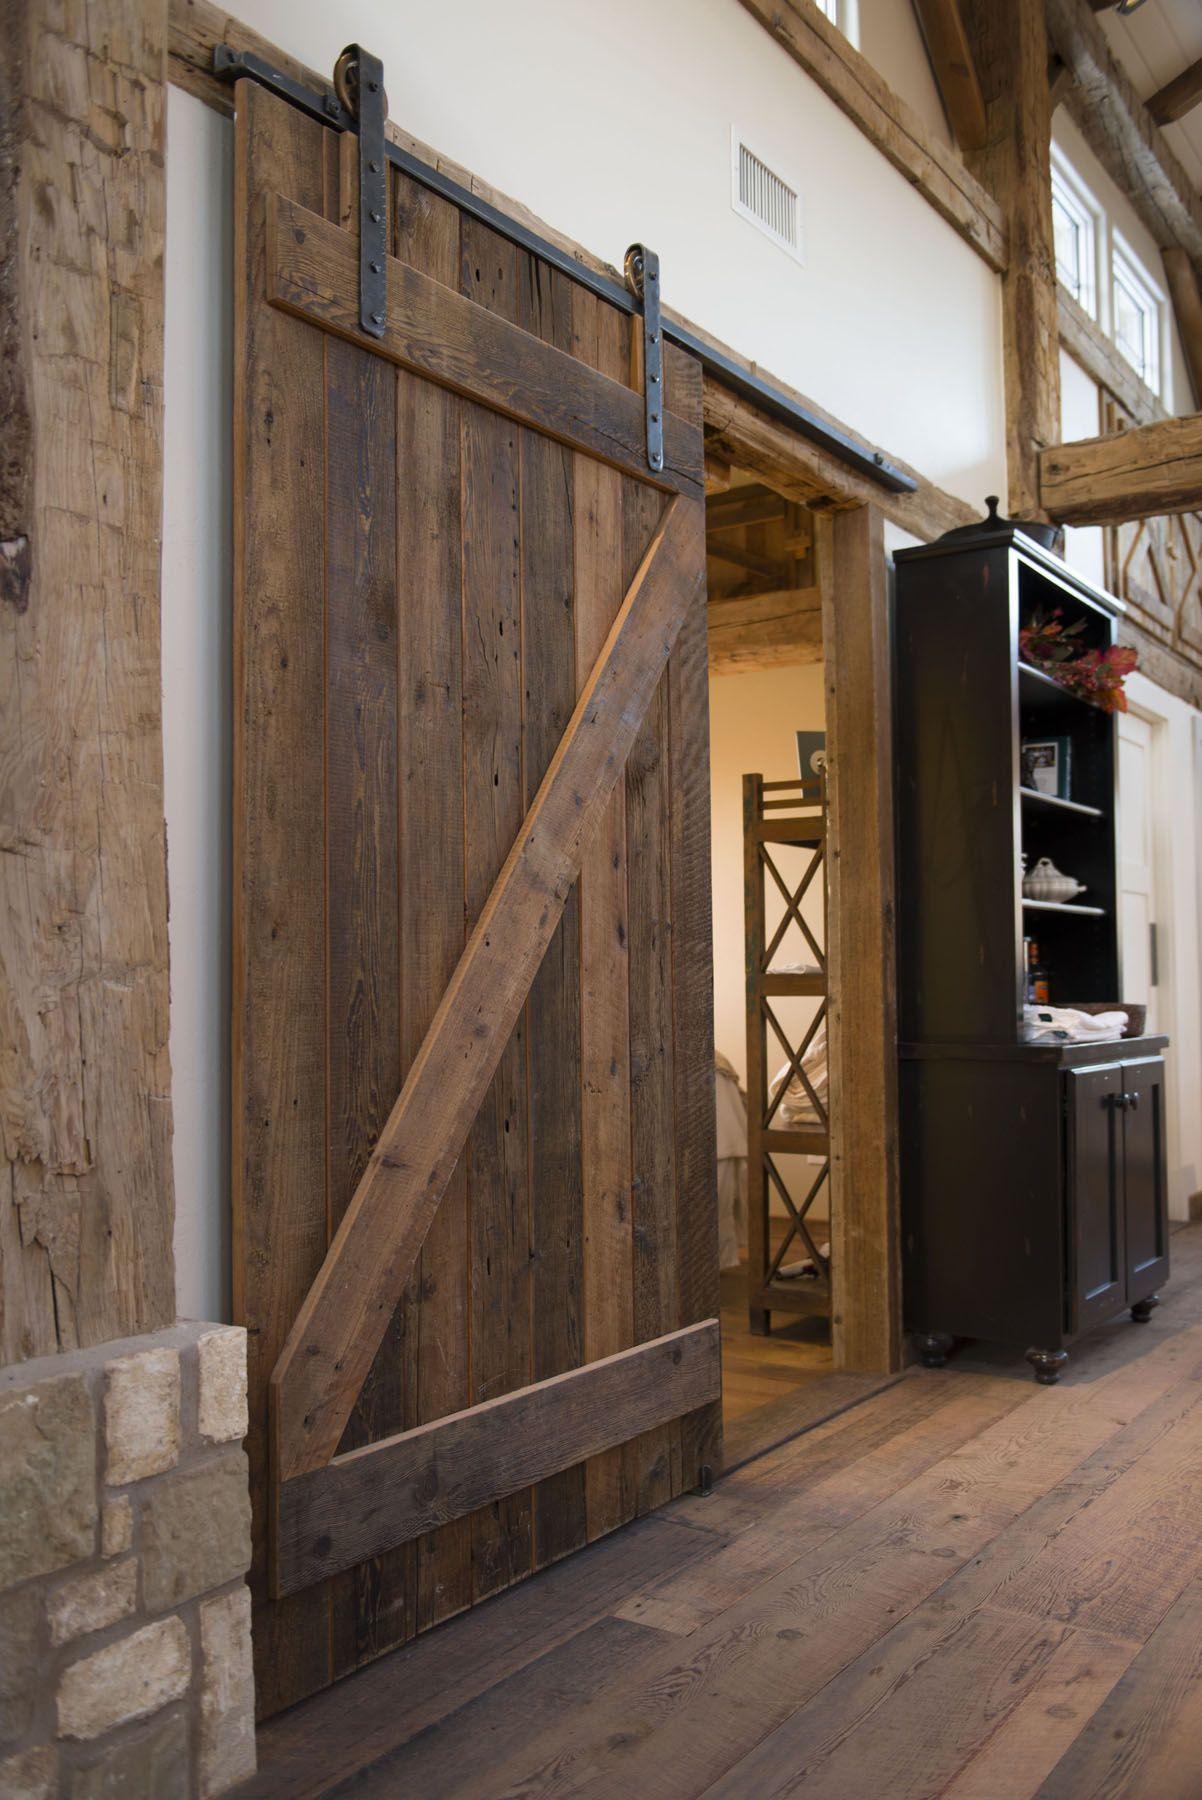 large barn sliders heritage restorations inspirations for our home pinterest rolltore. Black Bedroom Furniture Sets. Home Design Ideas